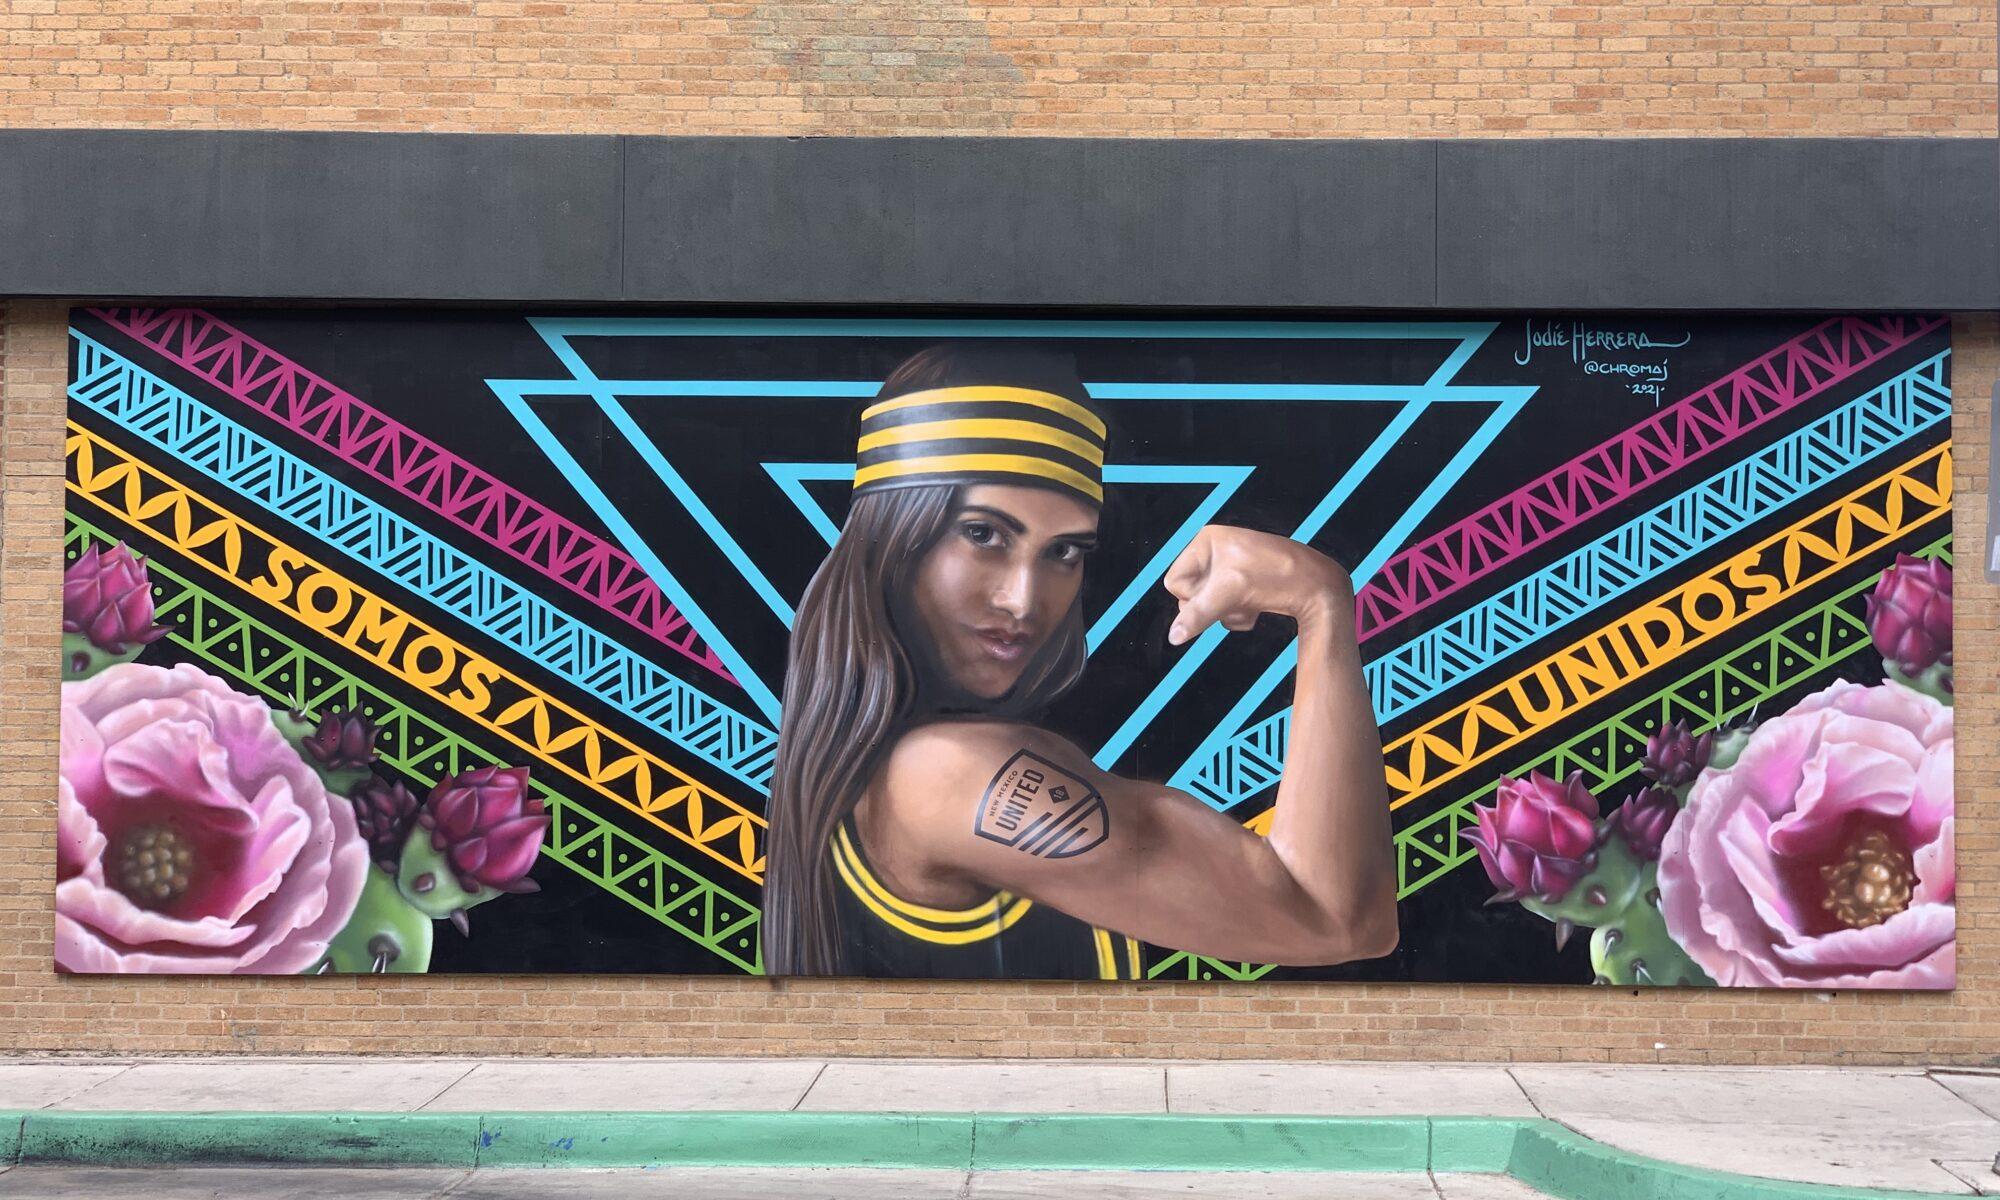 Woman Wearing NM United Attire Flexing Arm